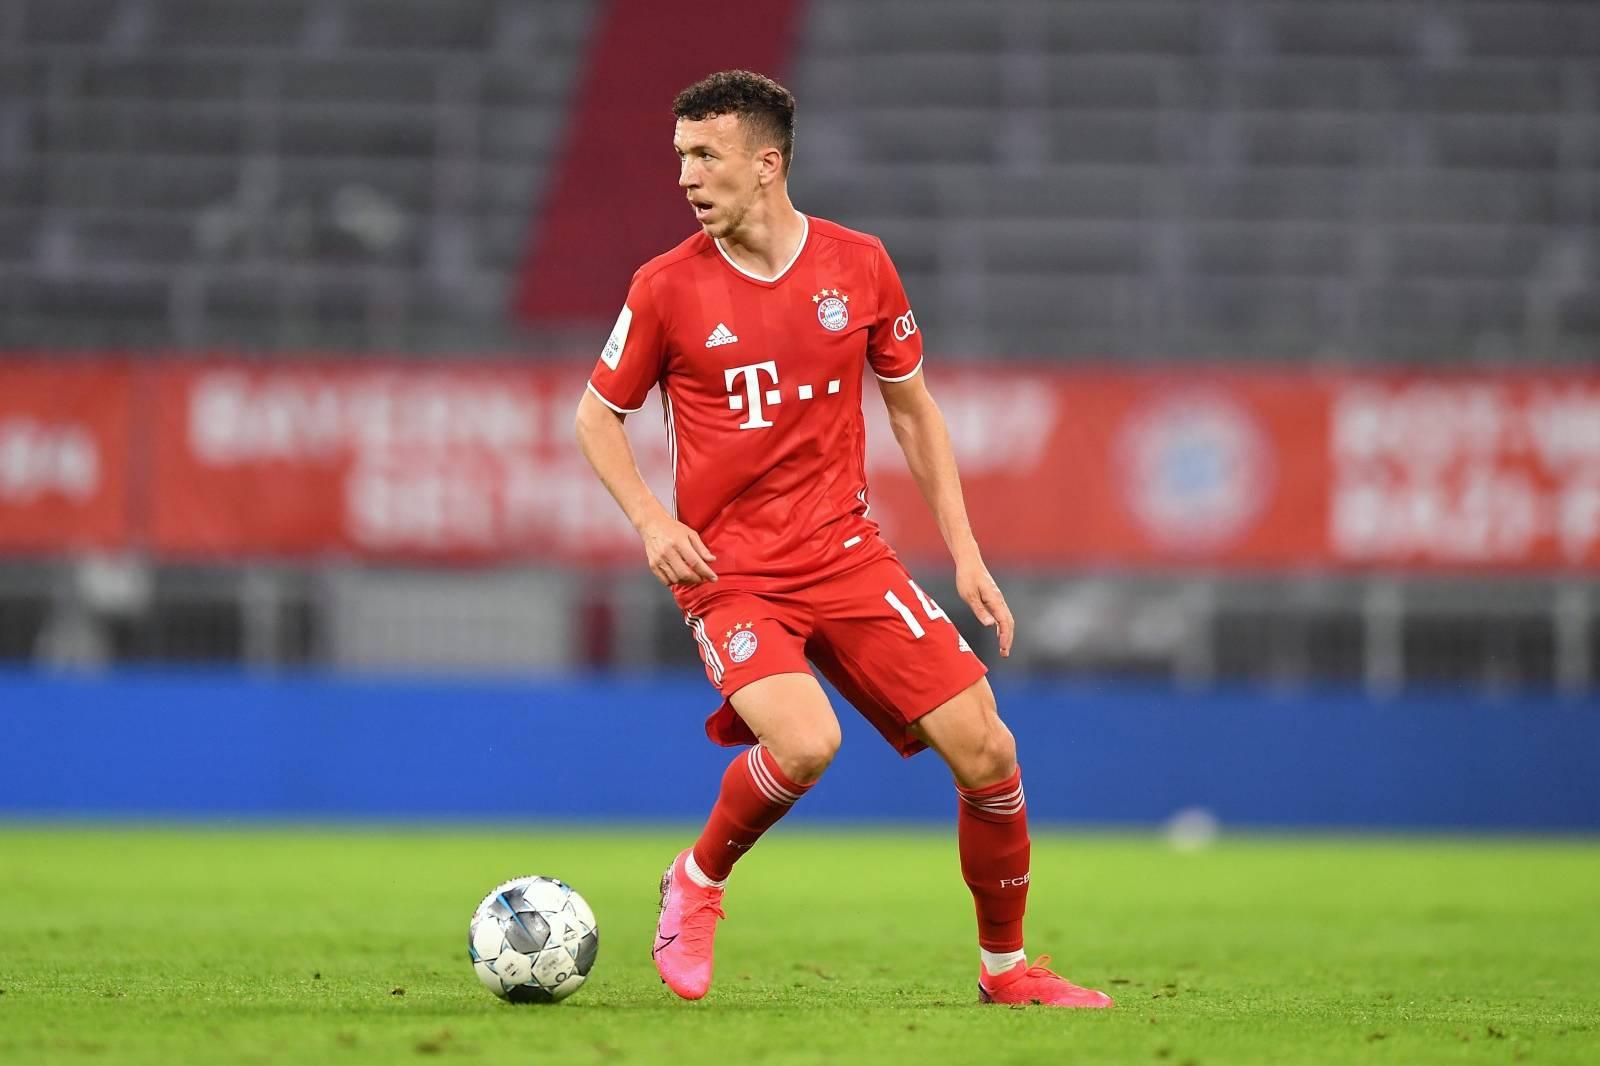 Sports: Football: DFB-Pokal, season 2019/2020, semi-finals, June 10th, 2020, FC Bayern Munich - Eintracht Frankfurt